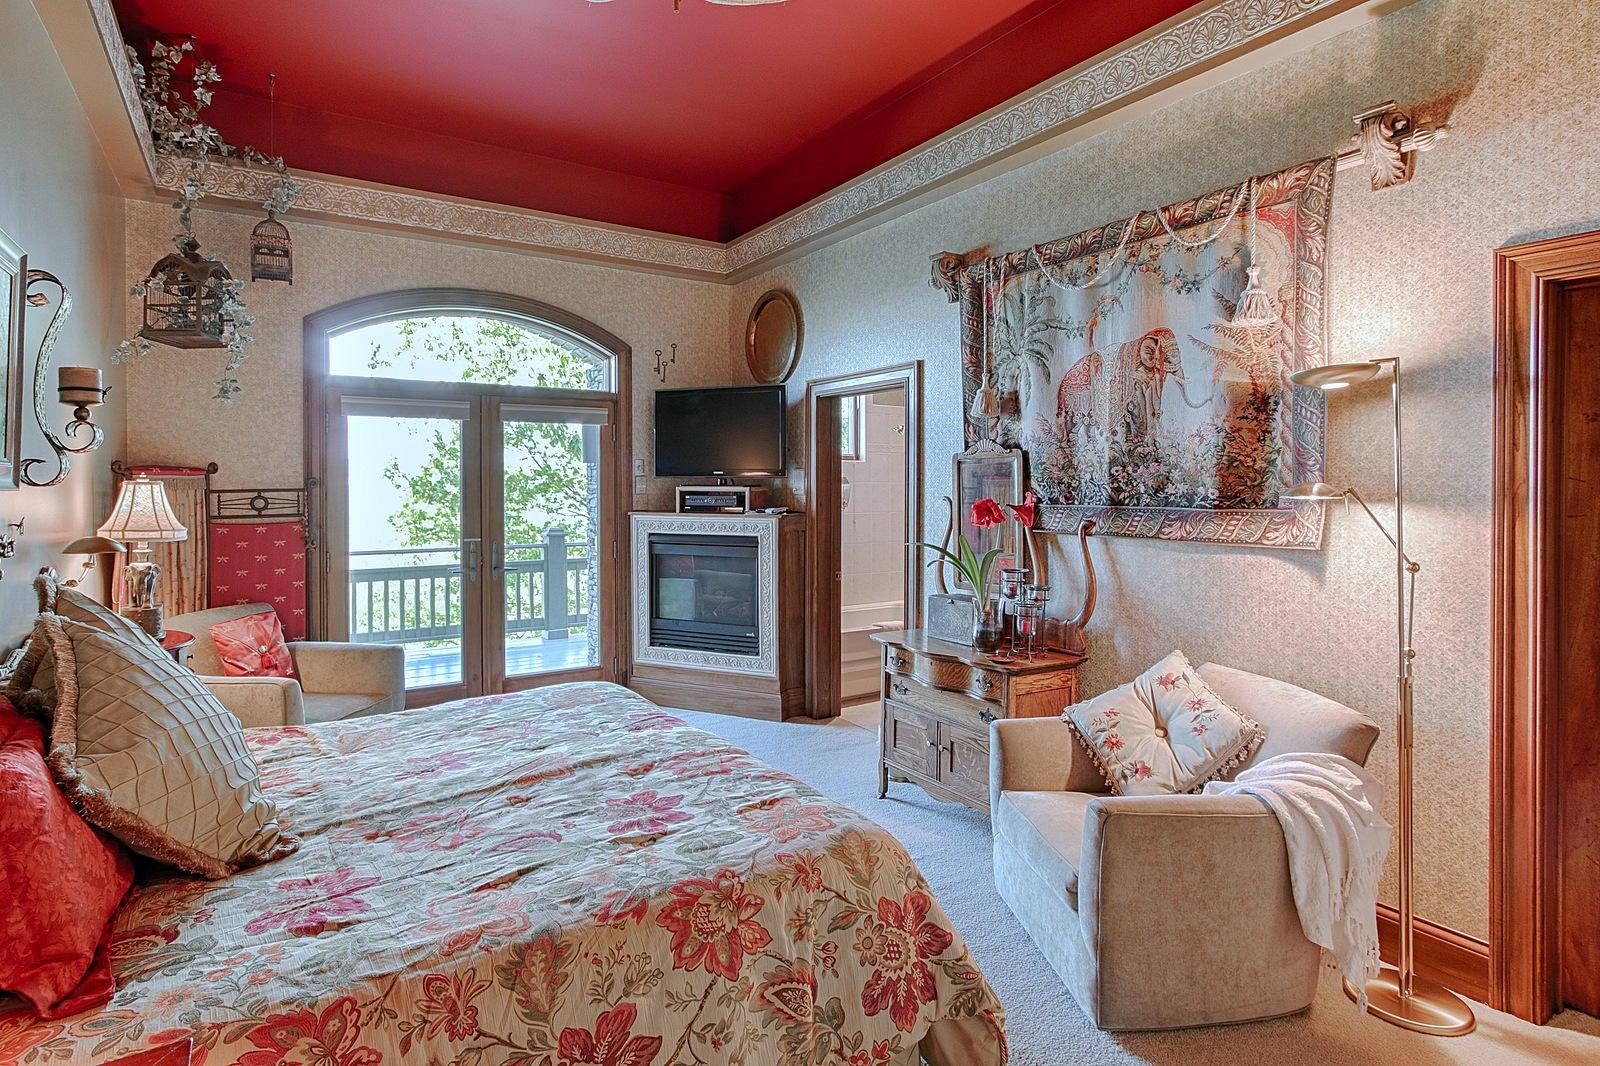 Bedroom 2 has fireplace